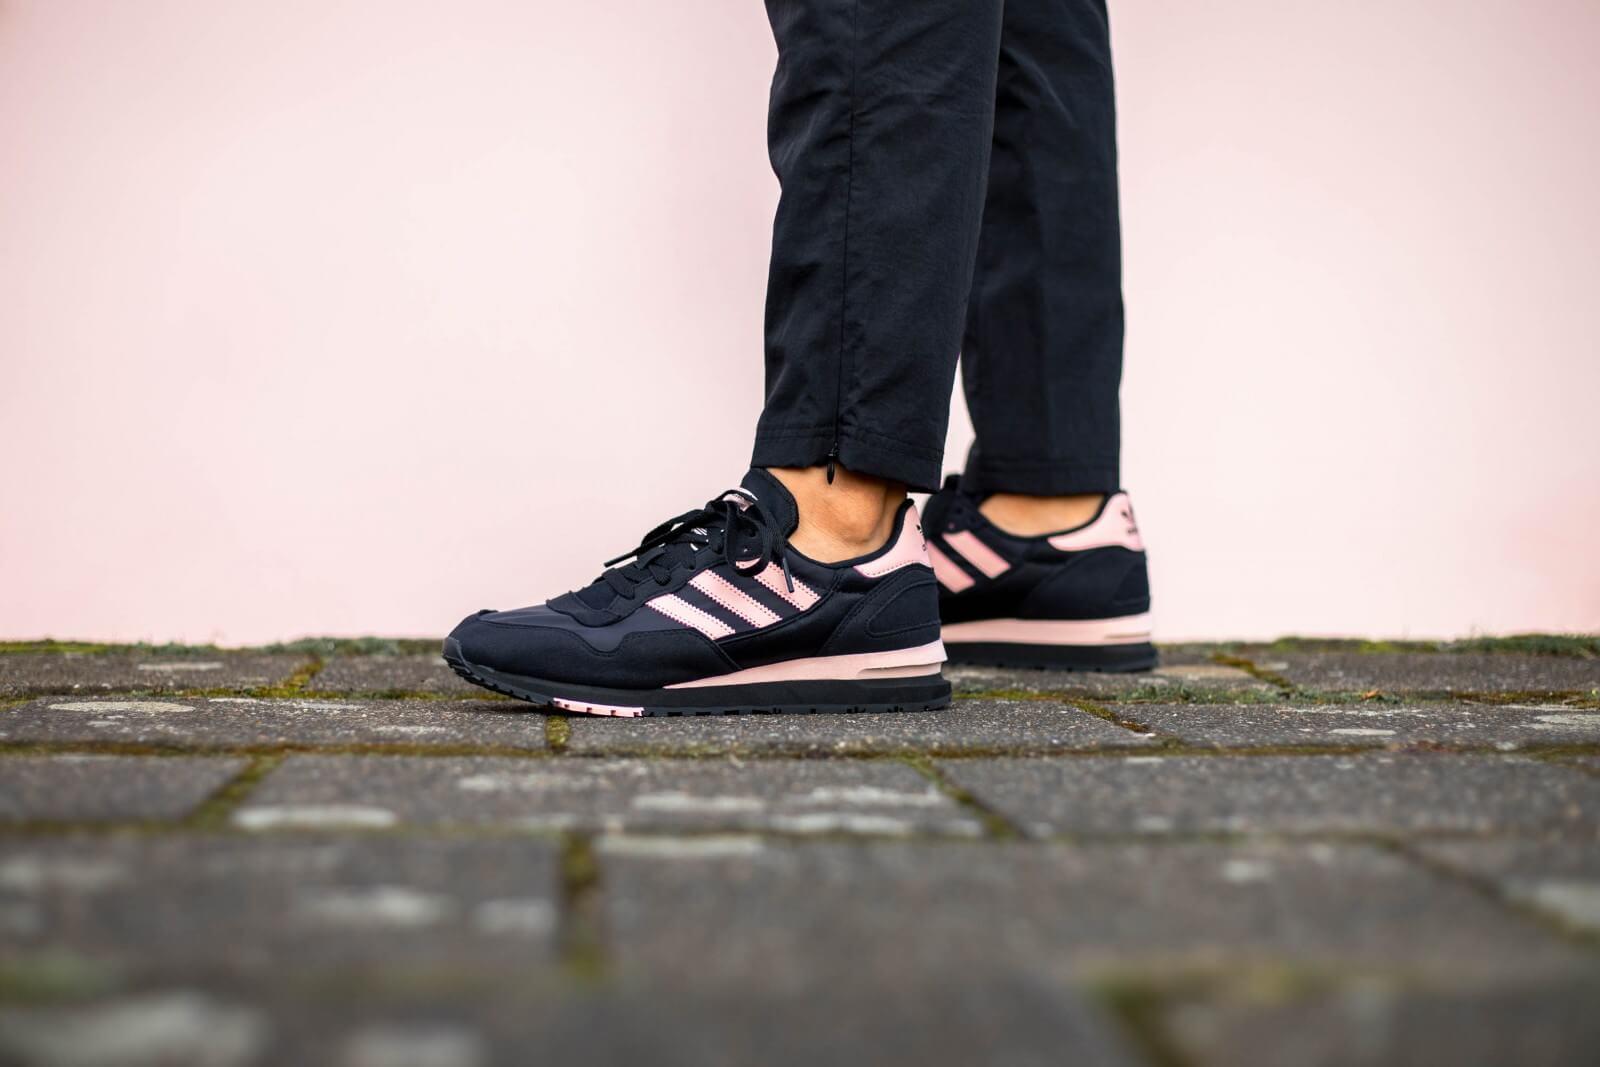 Adidas Lowertree Core Black/Vapour Pink